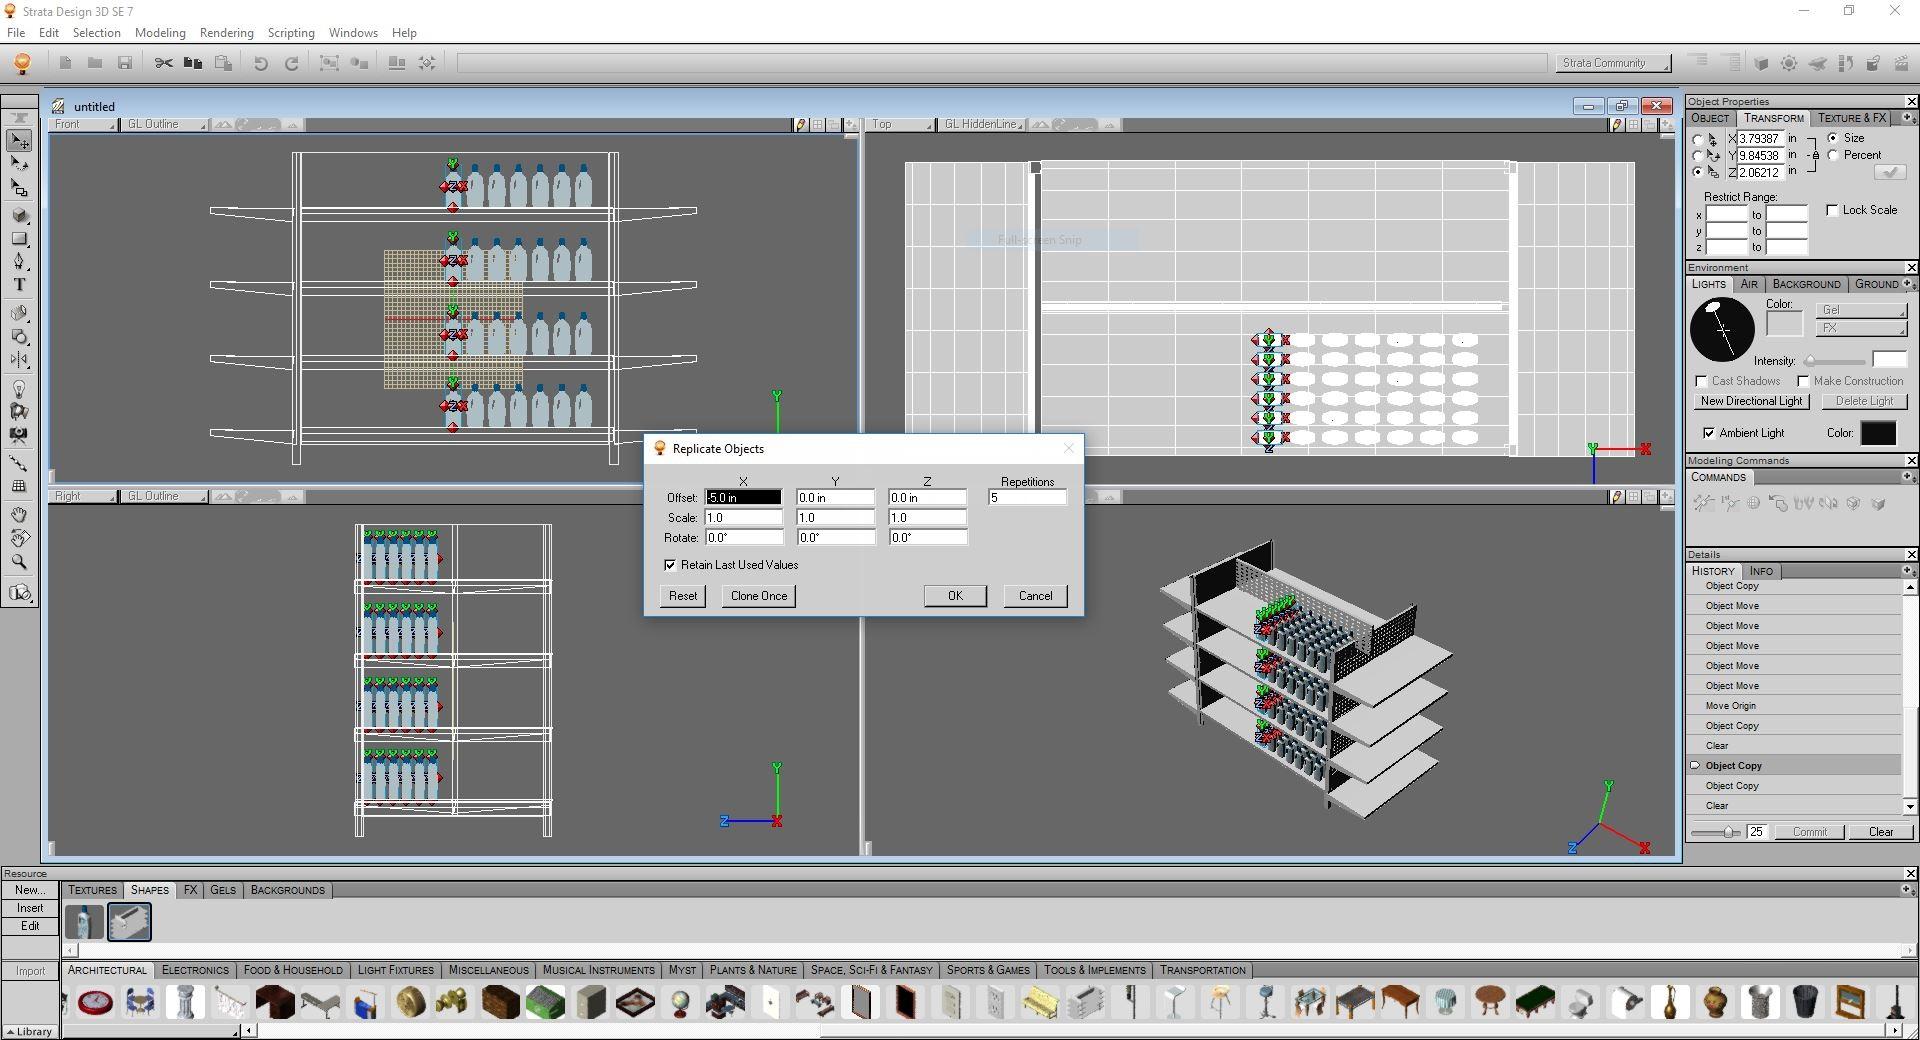 strata design 3d se steamstat ru